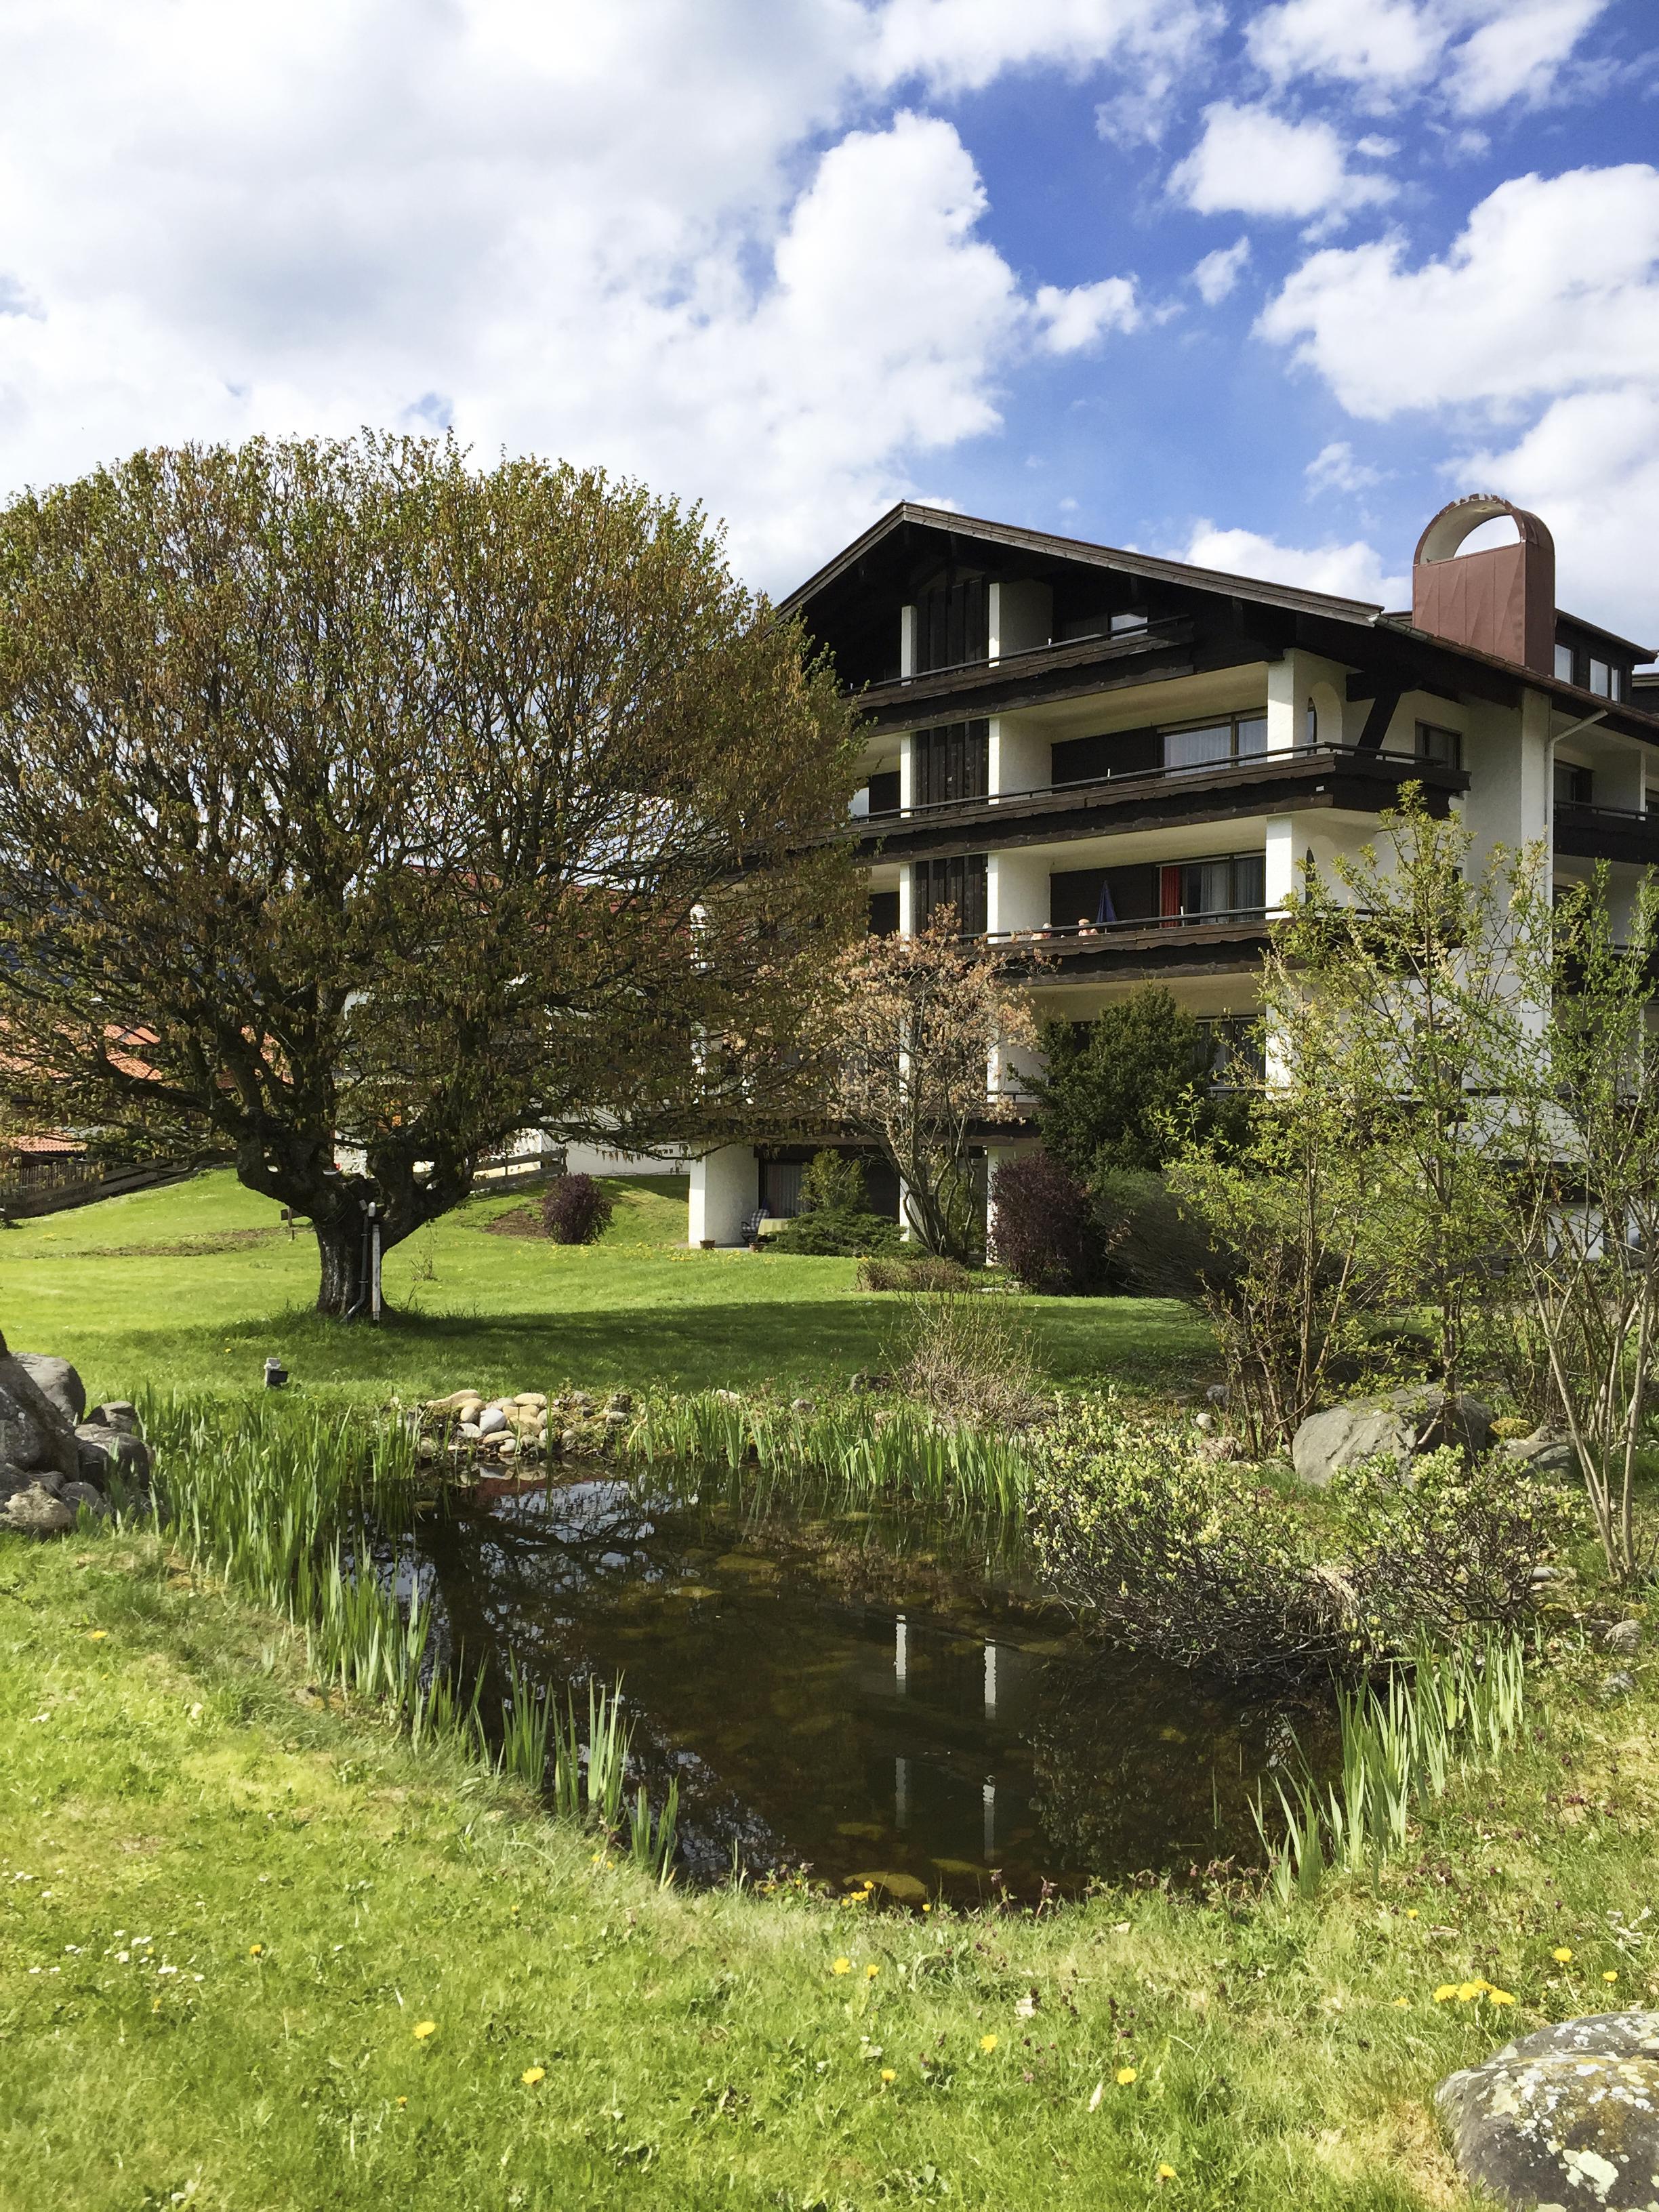 Detox Hotel Schuele Oberstdorf